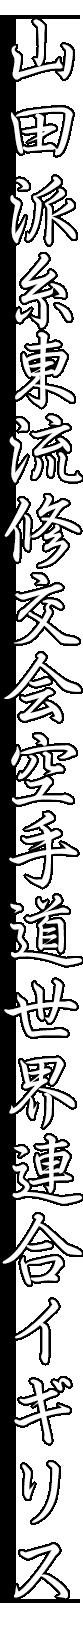 06---yssku_kanji_wht_thin_vert